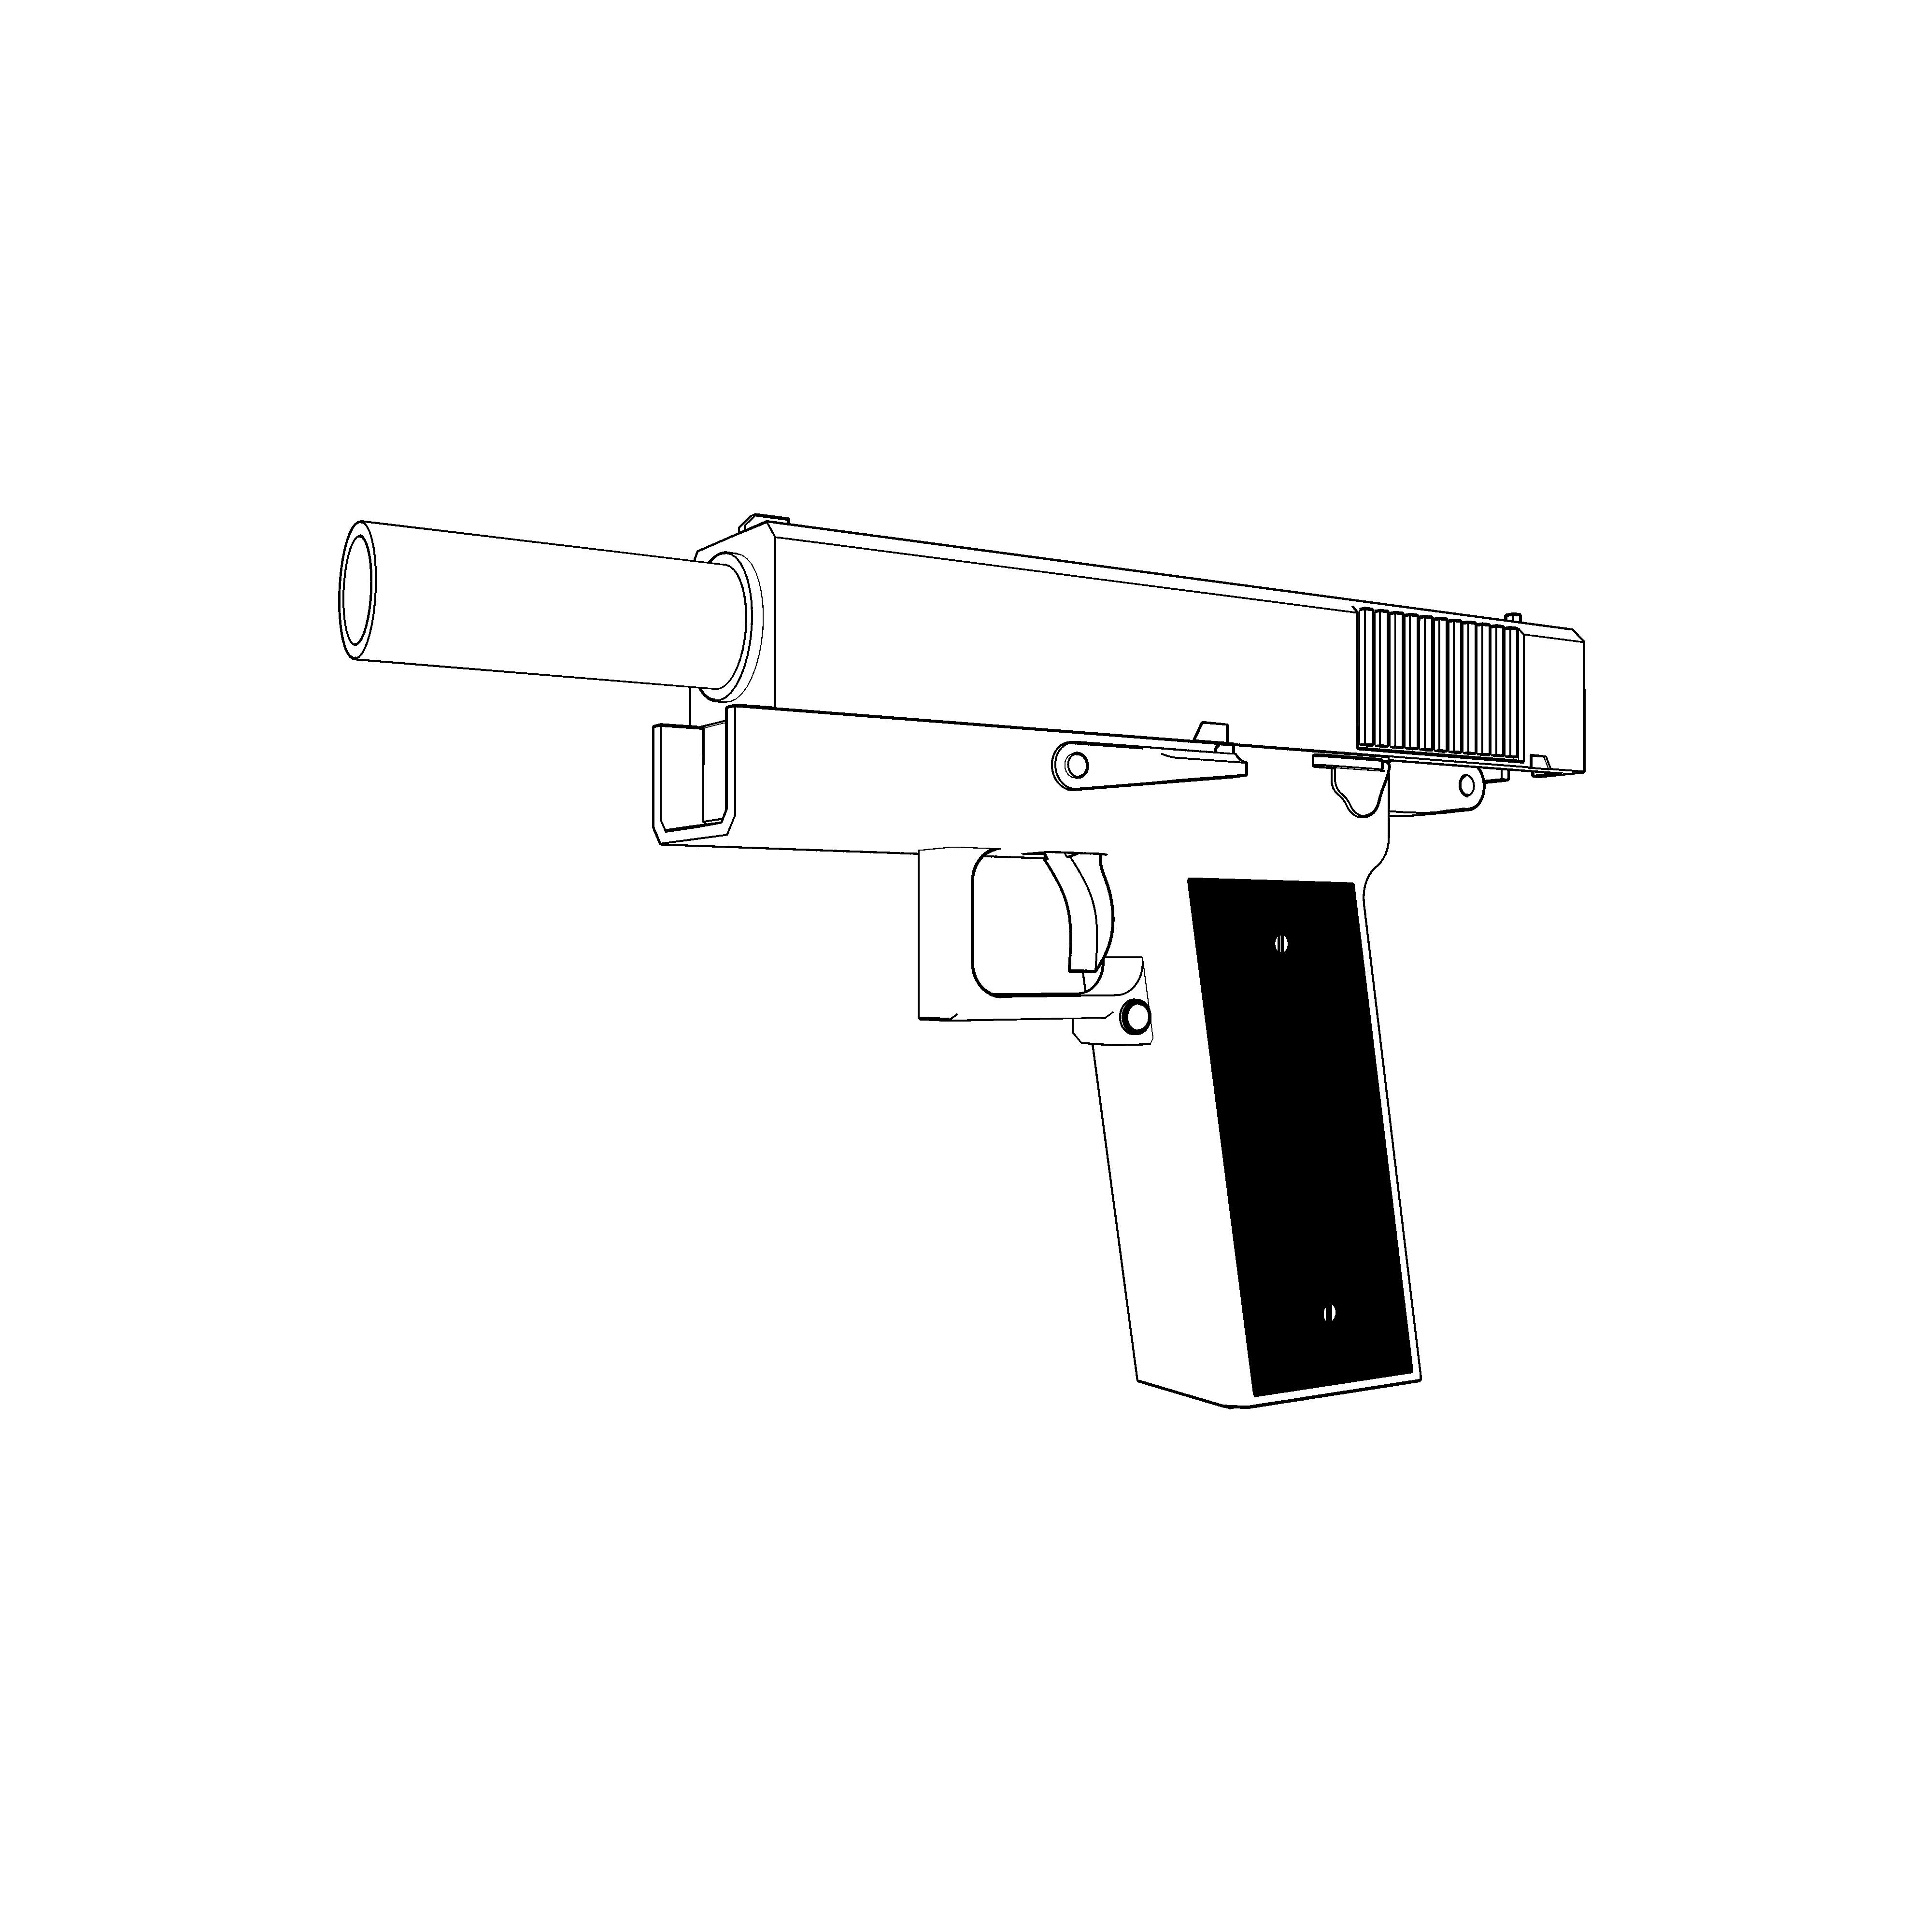 【Appliv】ピクセルガン3D。(Pixel Gun 3D) [Android]